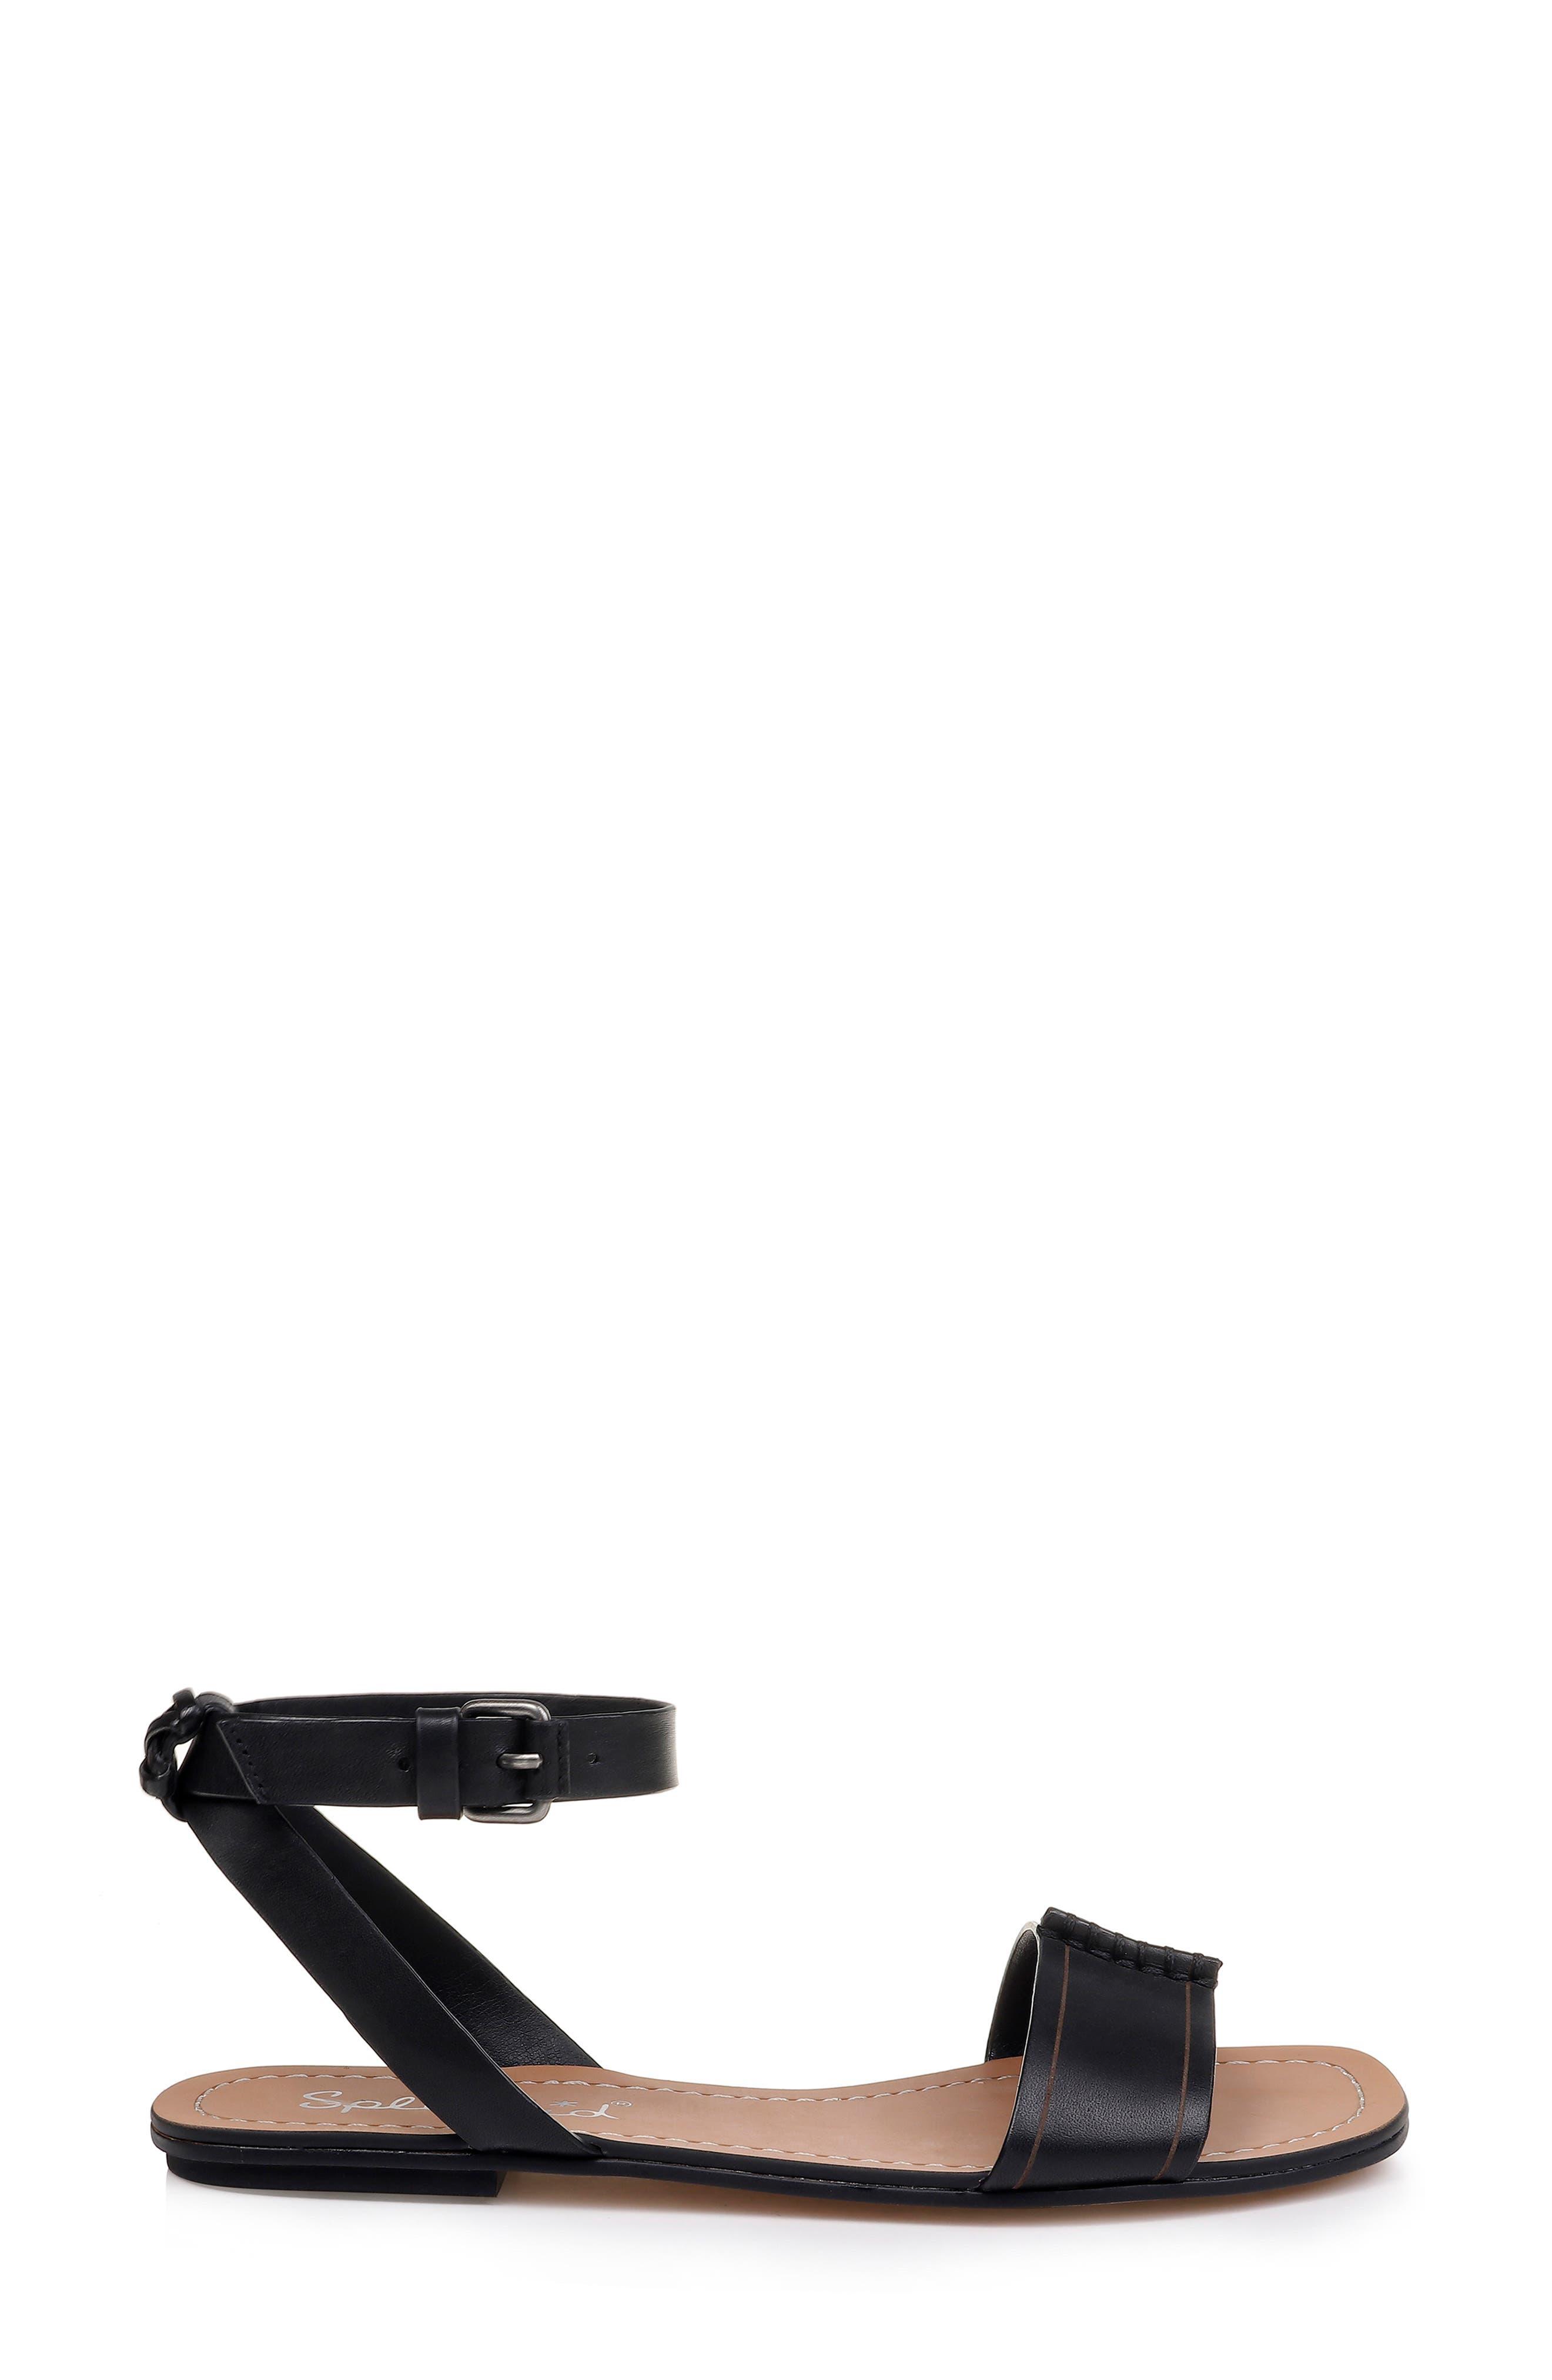 SPLENDID, Tabitha Ankle Strap Flat Sandal, Alternate thumbnail 3, color, BLACK LEATHER